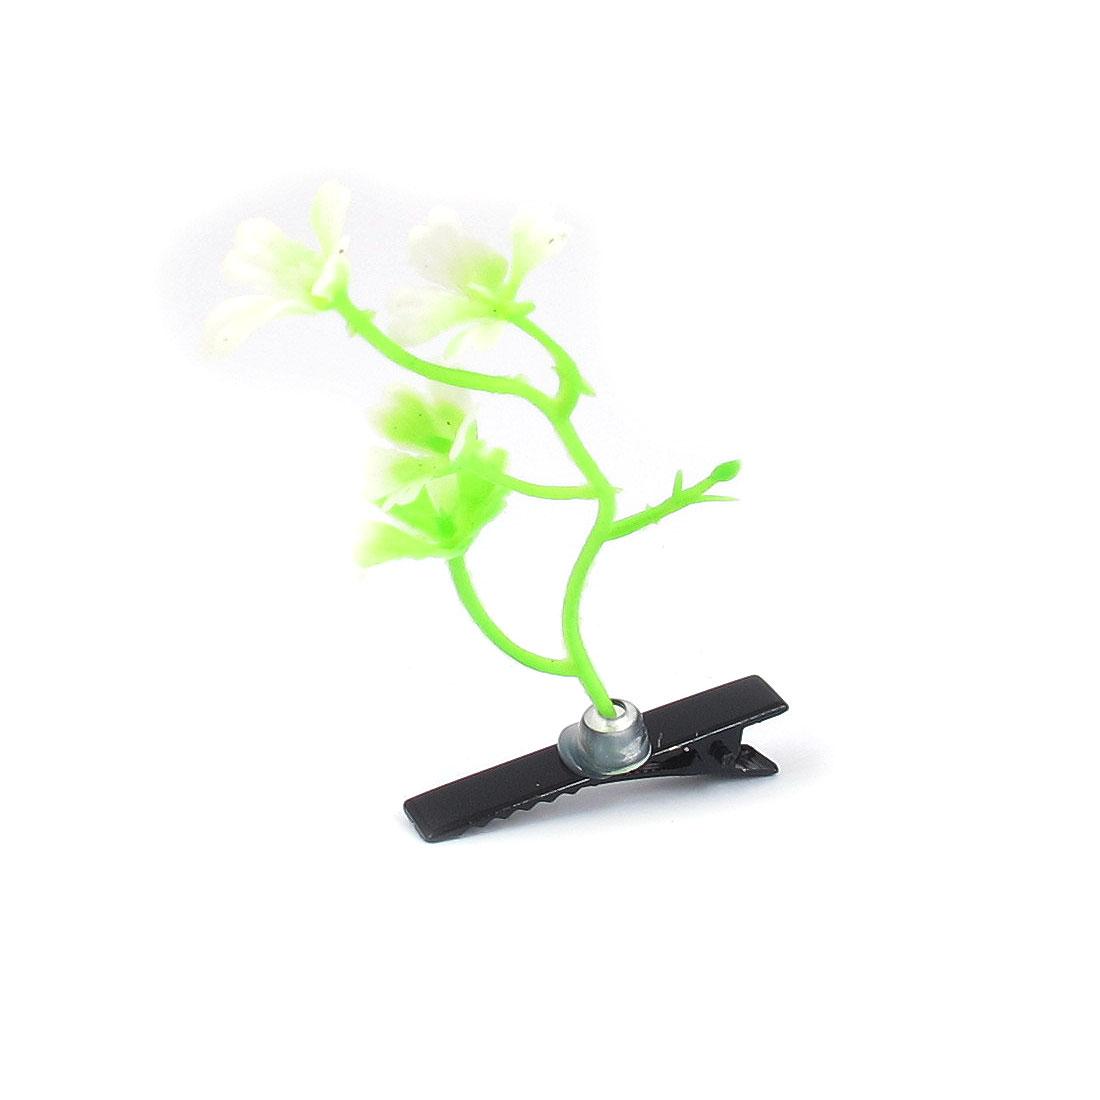 Flower Plant Antenna Hair Clips Hairpins Yellow Green for Girls Children